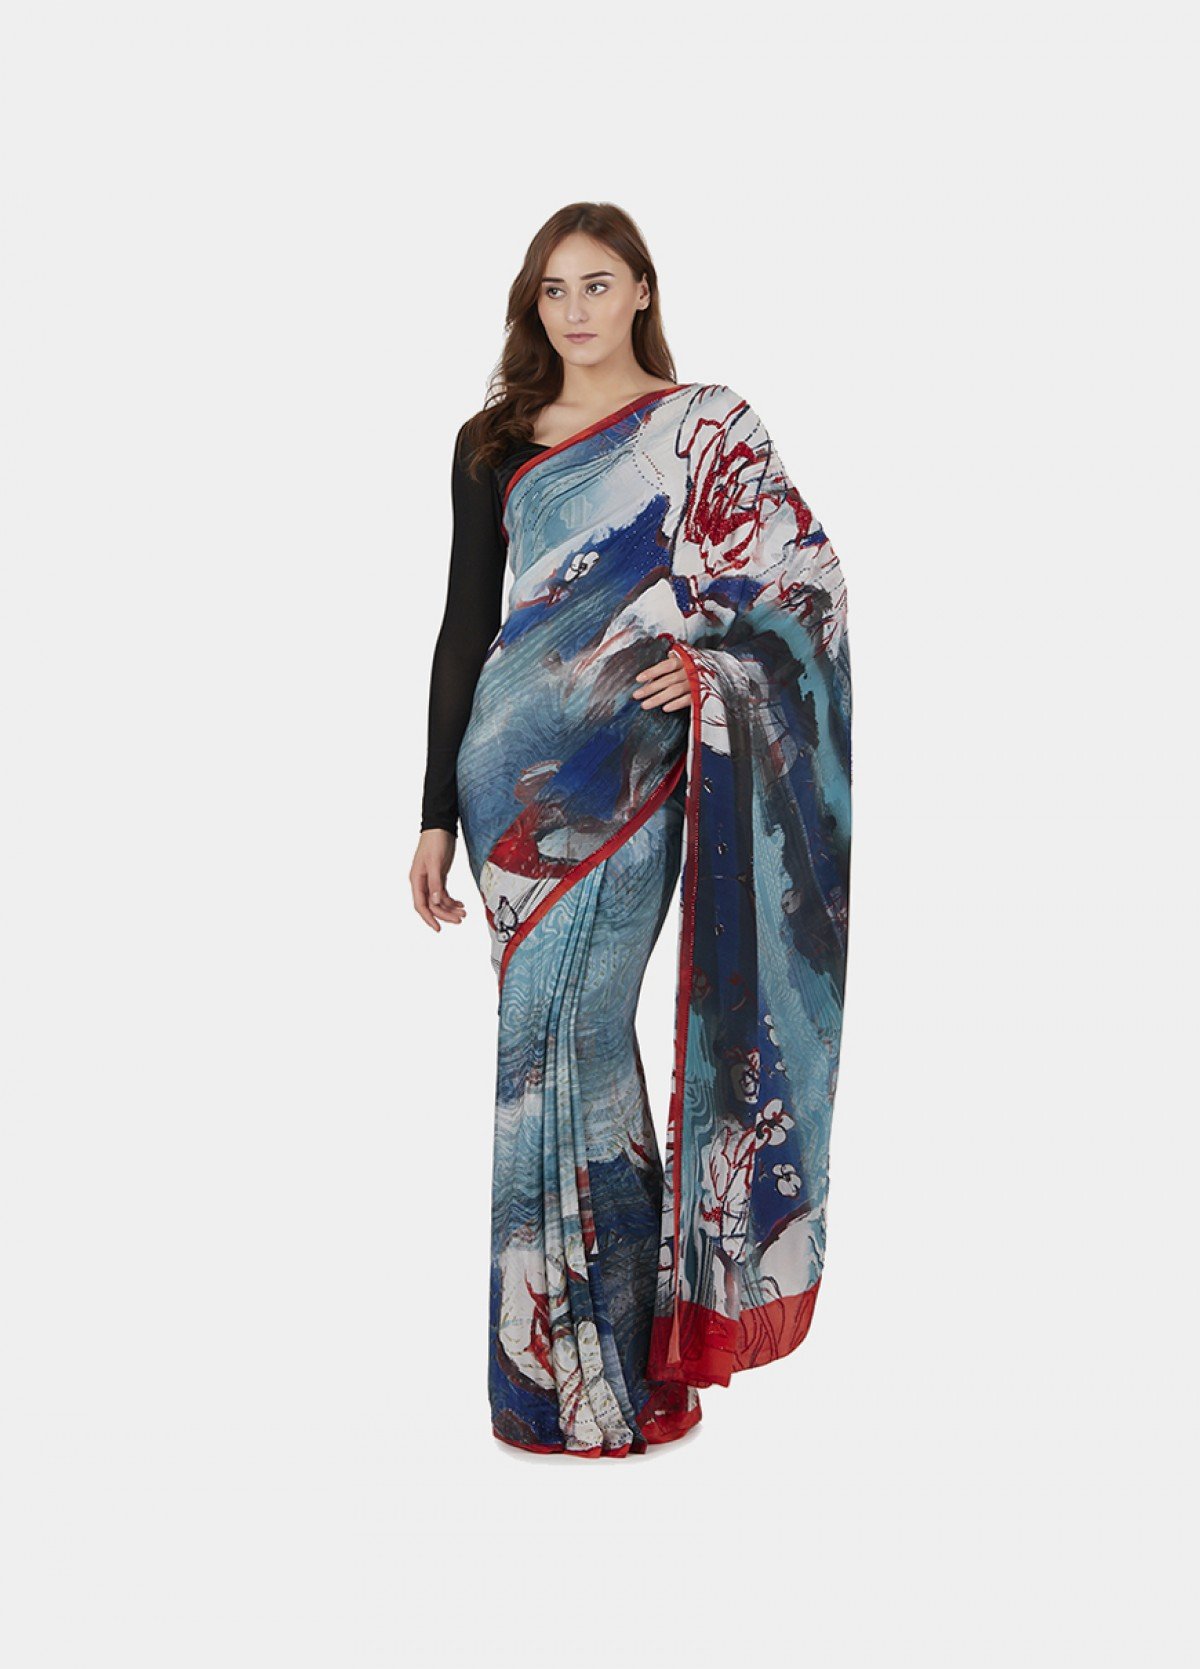 The Floral Sari